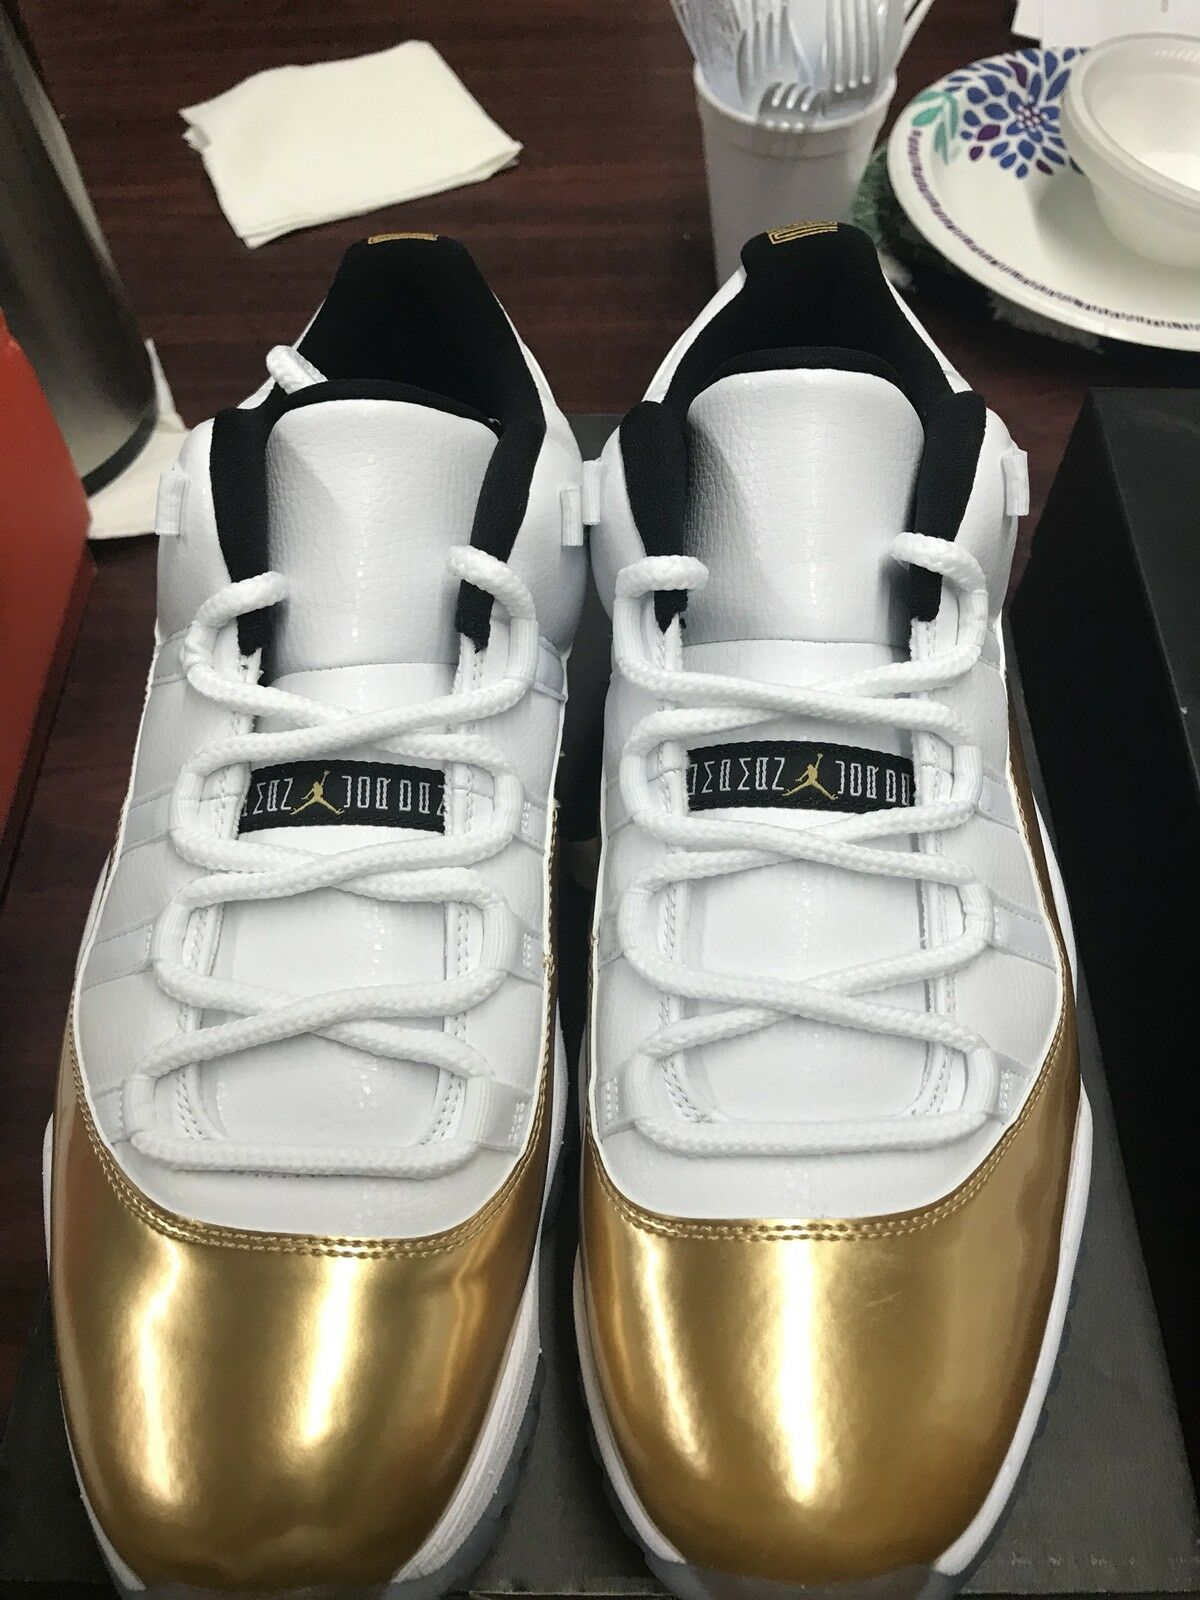 Nike Air Jordan Retro 11 Low Closing Ceremony Gold Bred Toe Royal Shadow